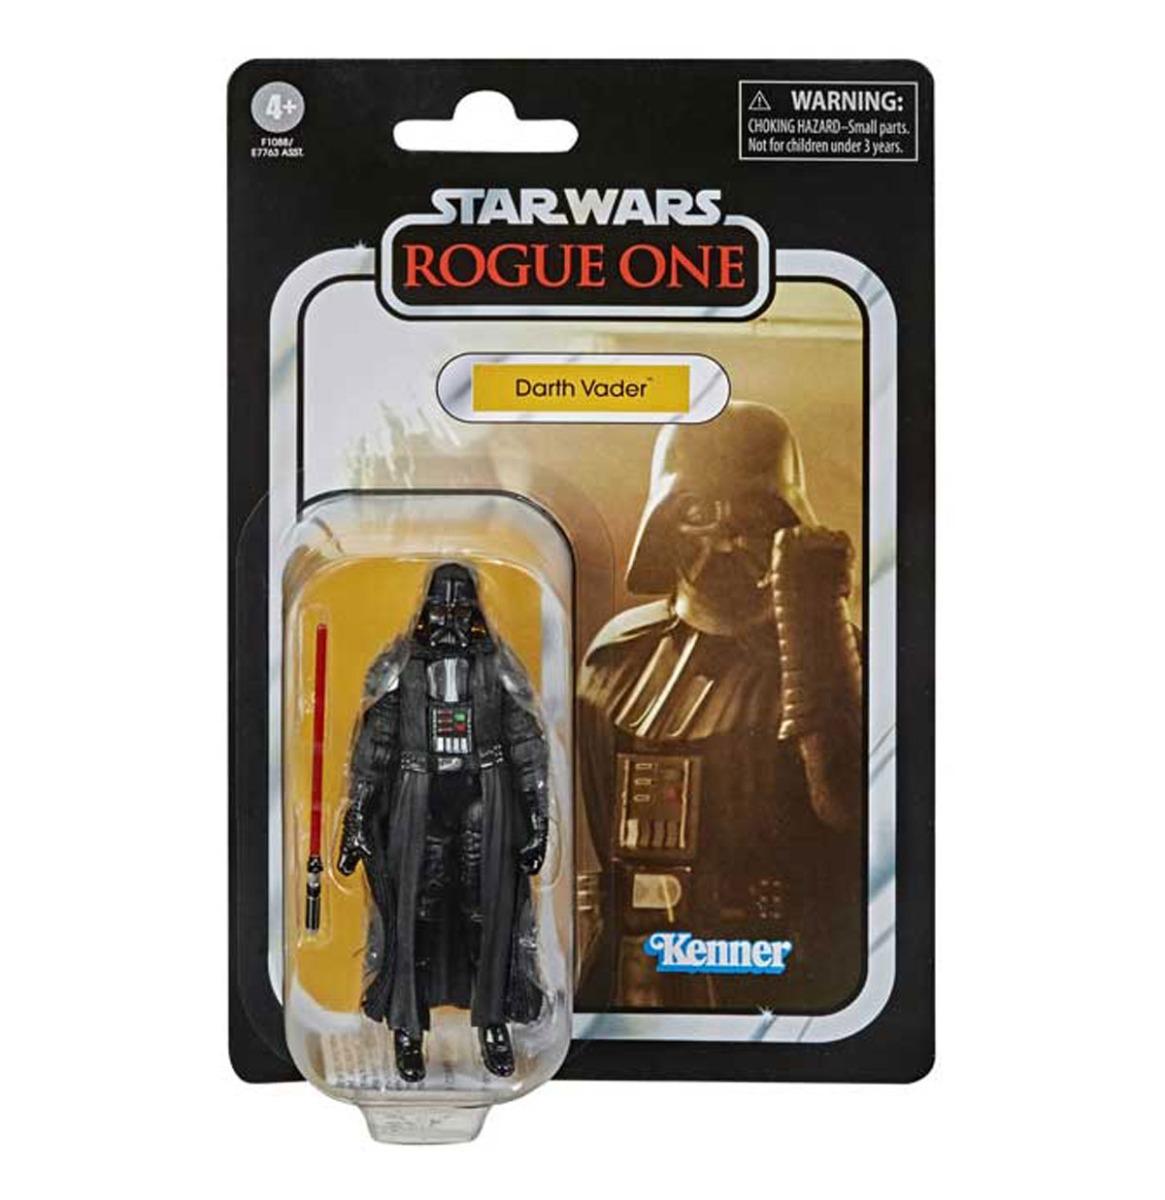 Star Wars: The Vintage Collection - Darth Vader Rogue One 3.75 inch Actie Figuur